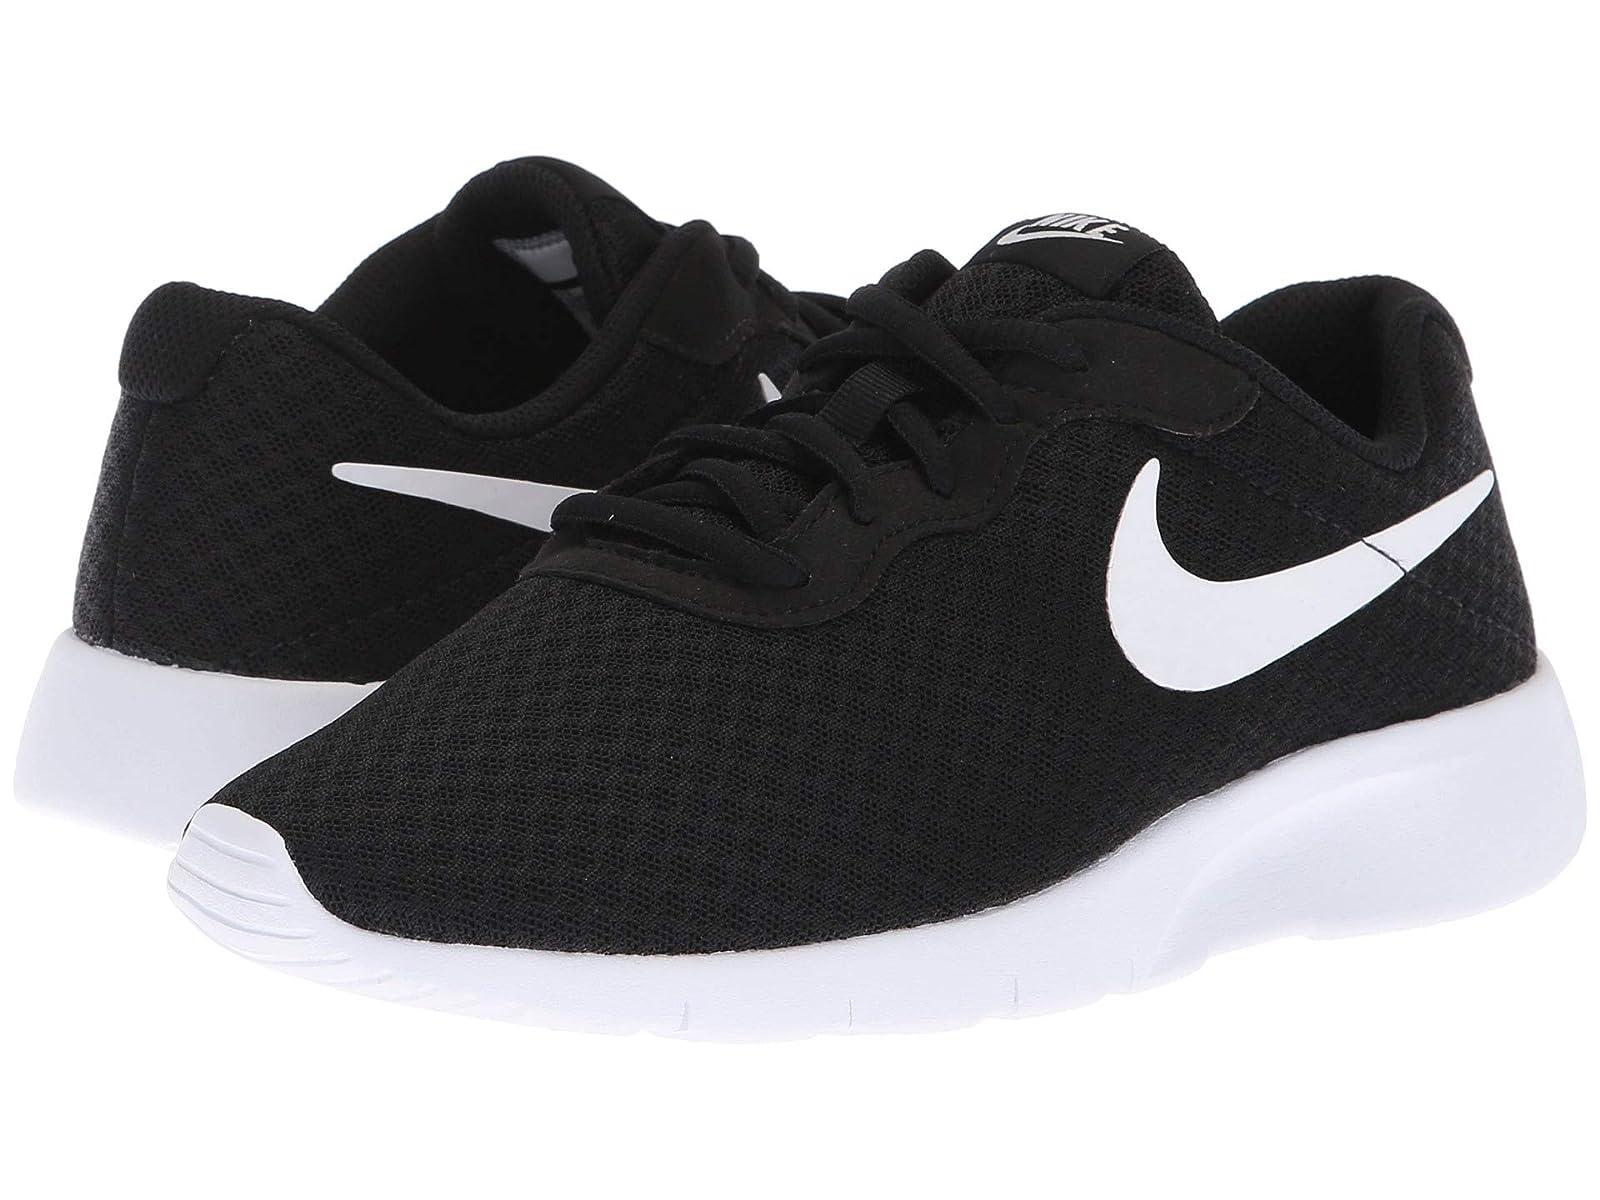 Nike Kids Tanjun Wide (Big Kid)Atmospheric grades have affordable shoes